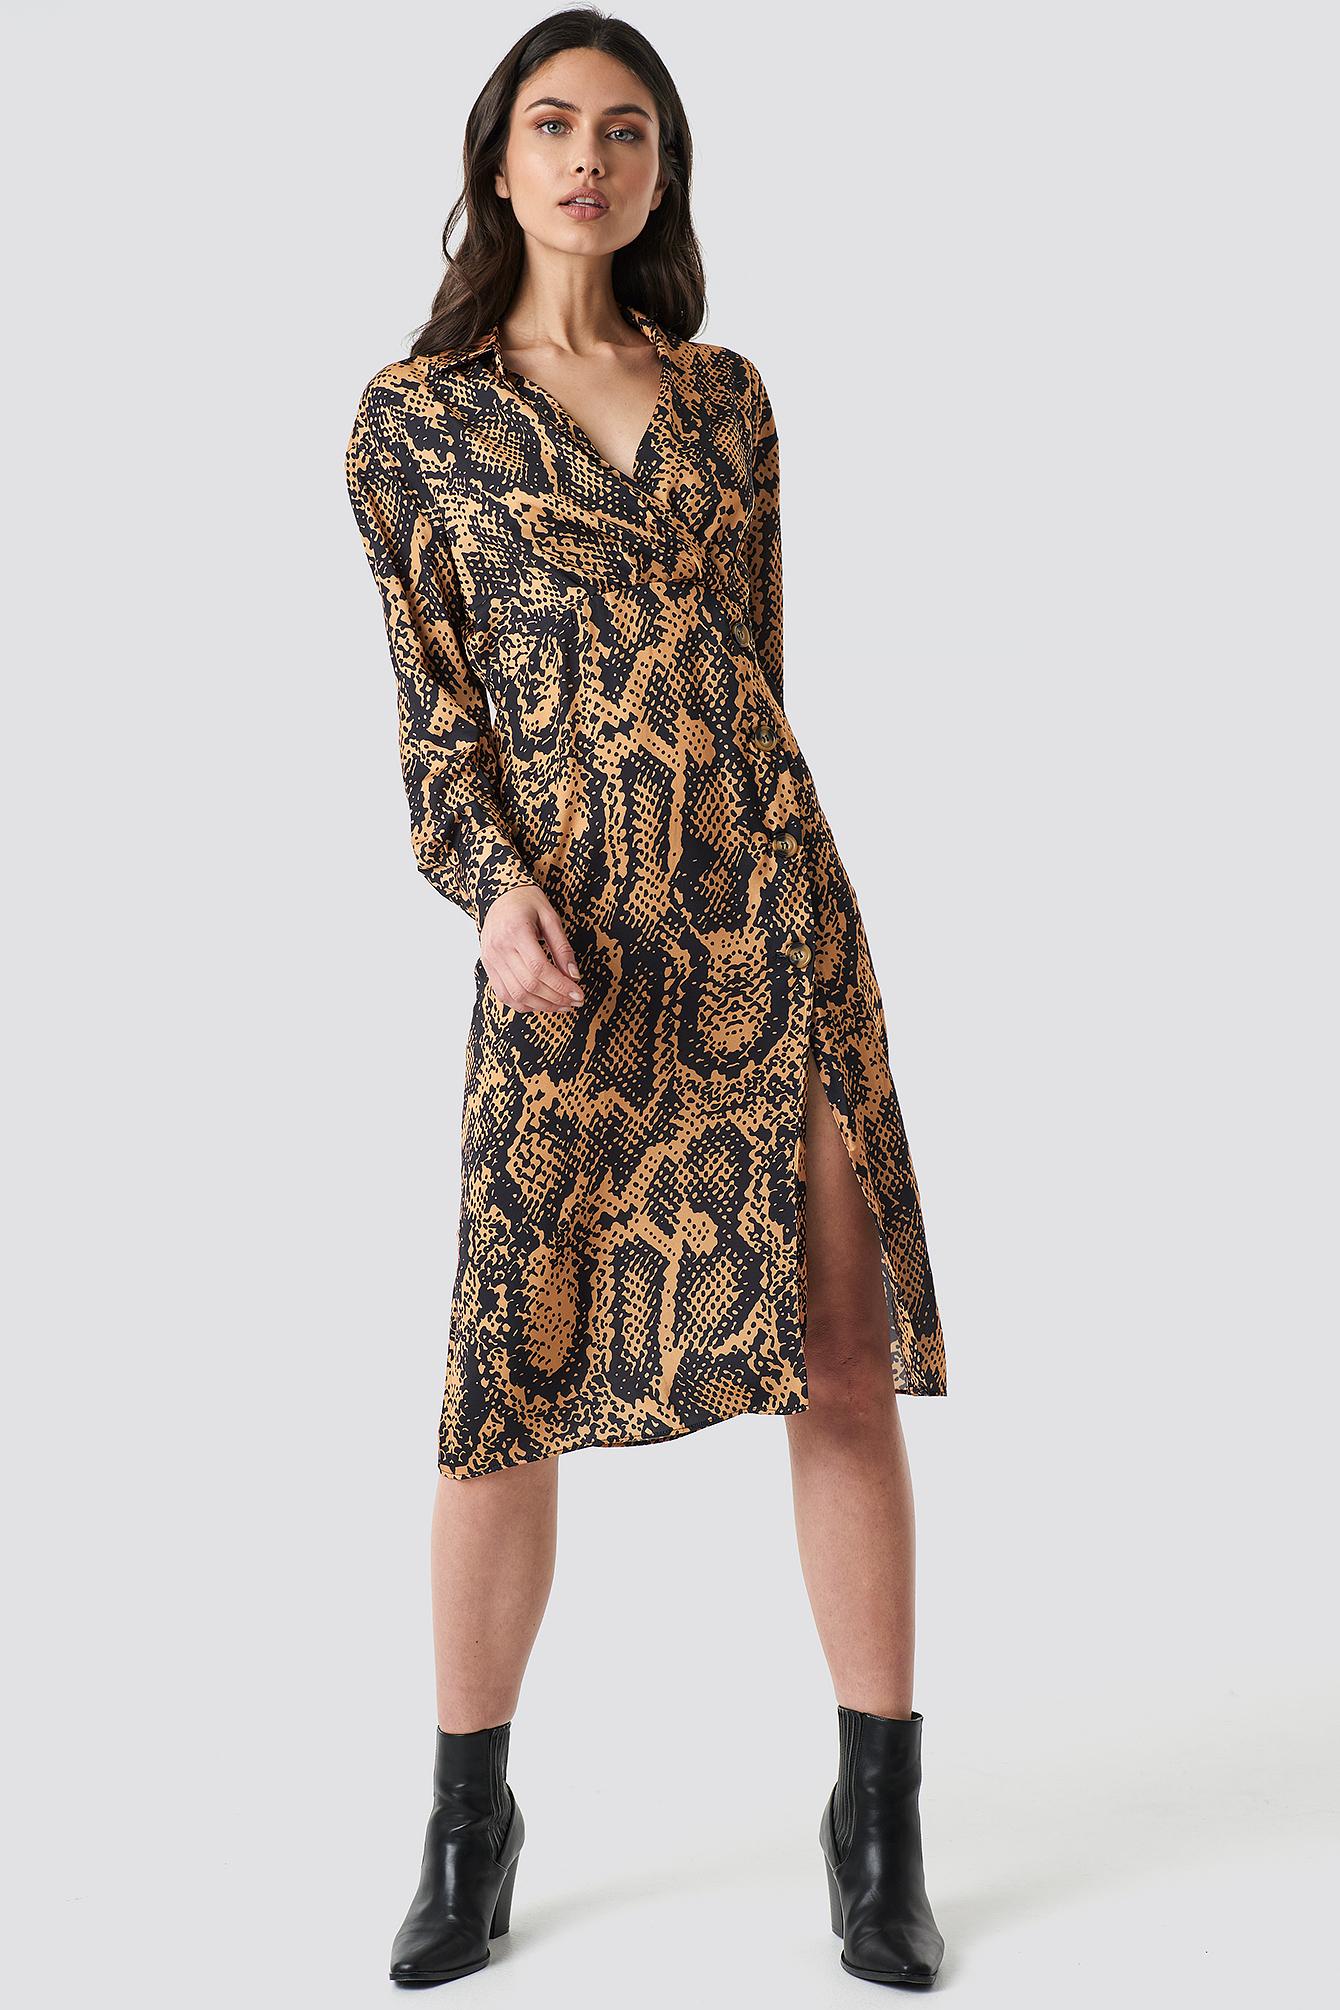 trendyol -  Snake Patterned Midi Dress - Multicolor